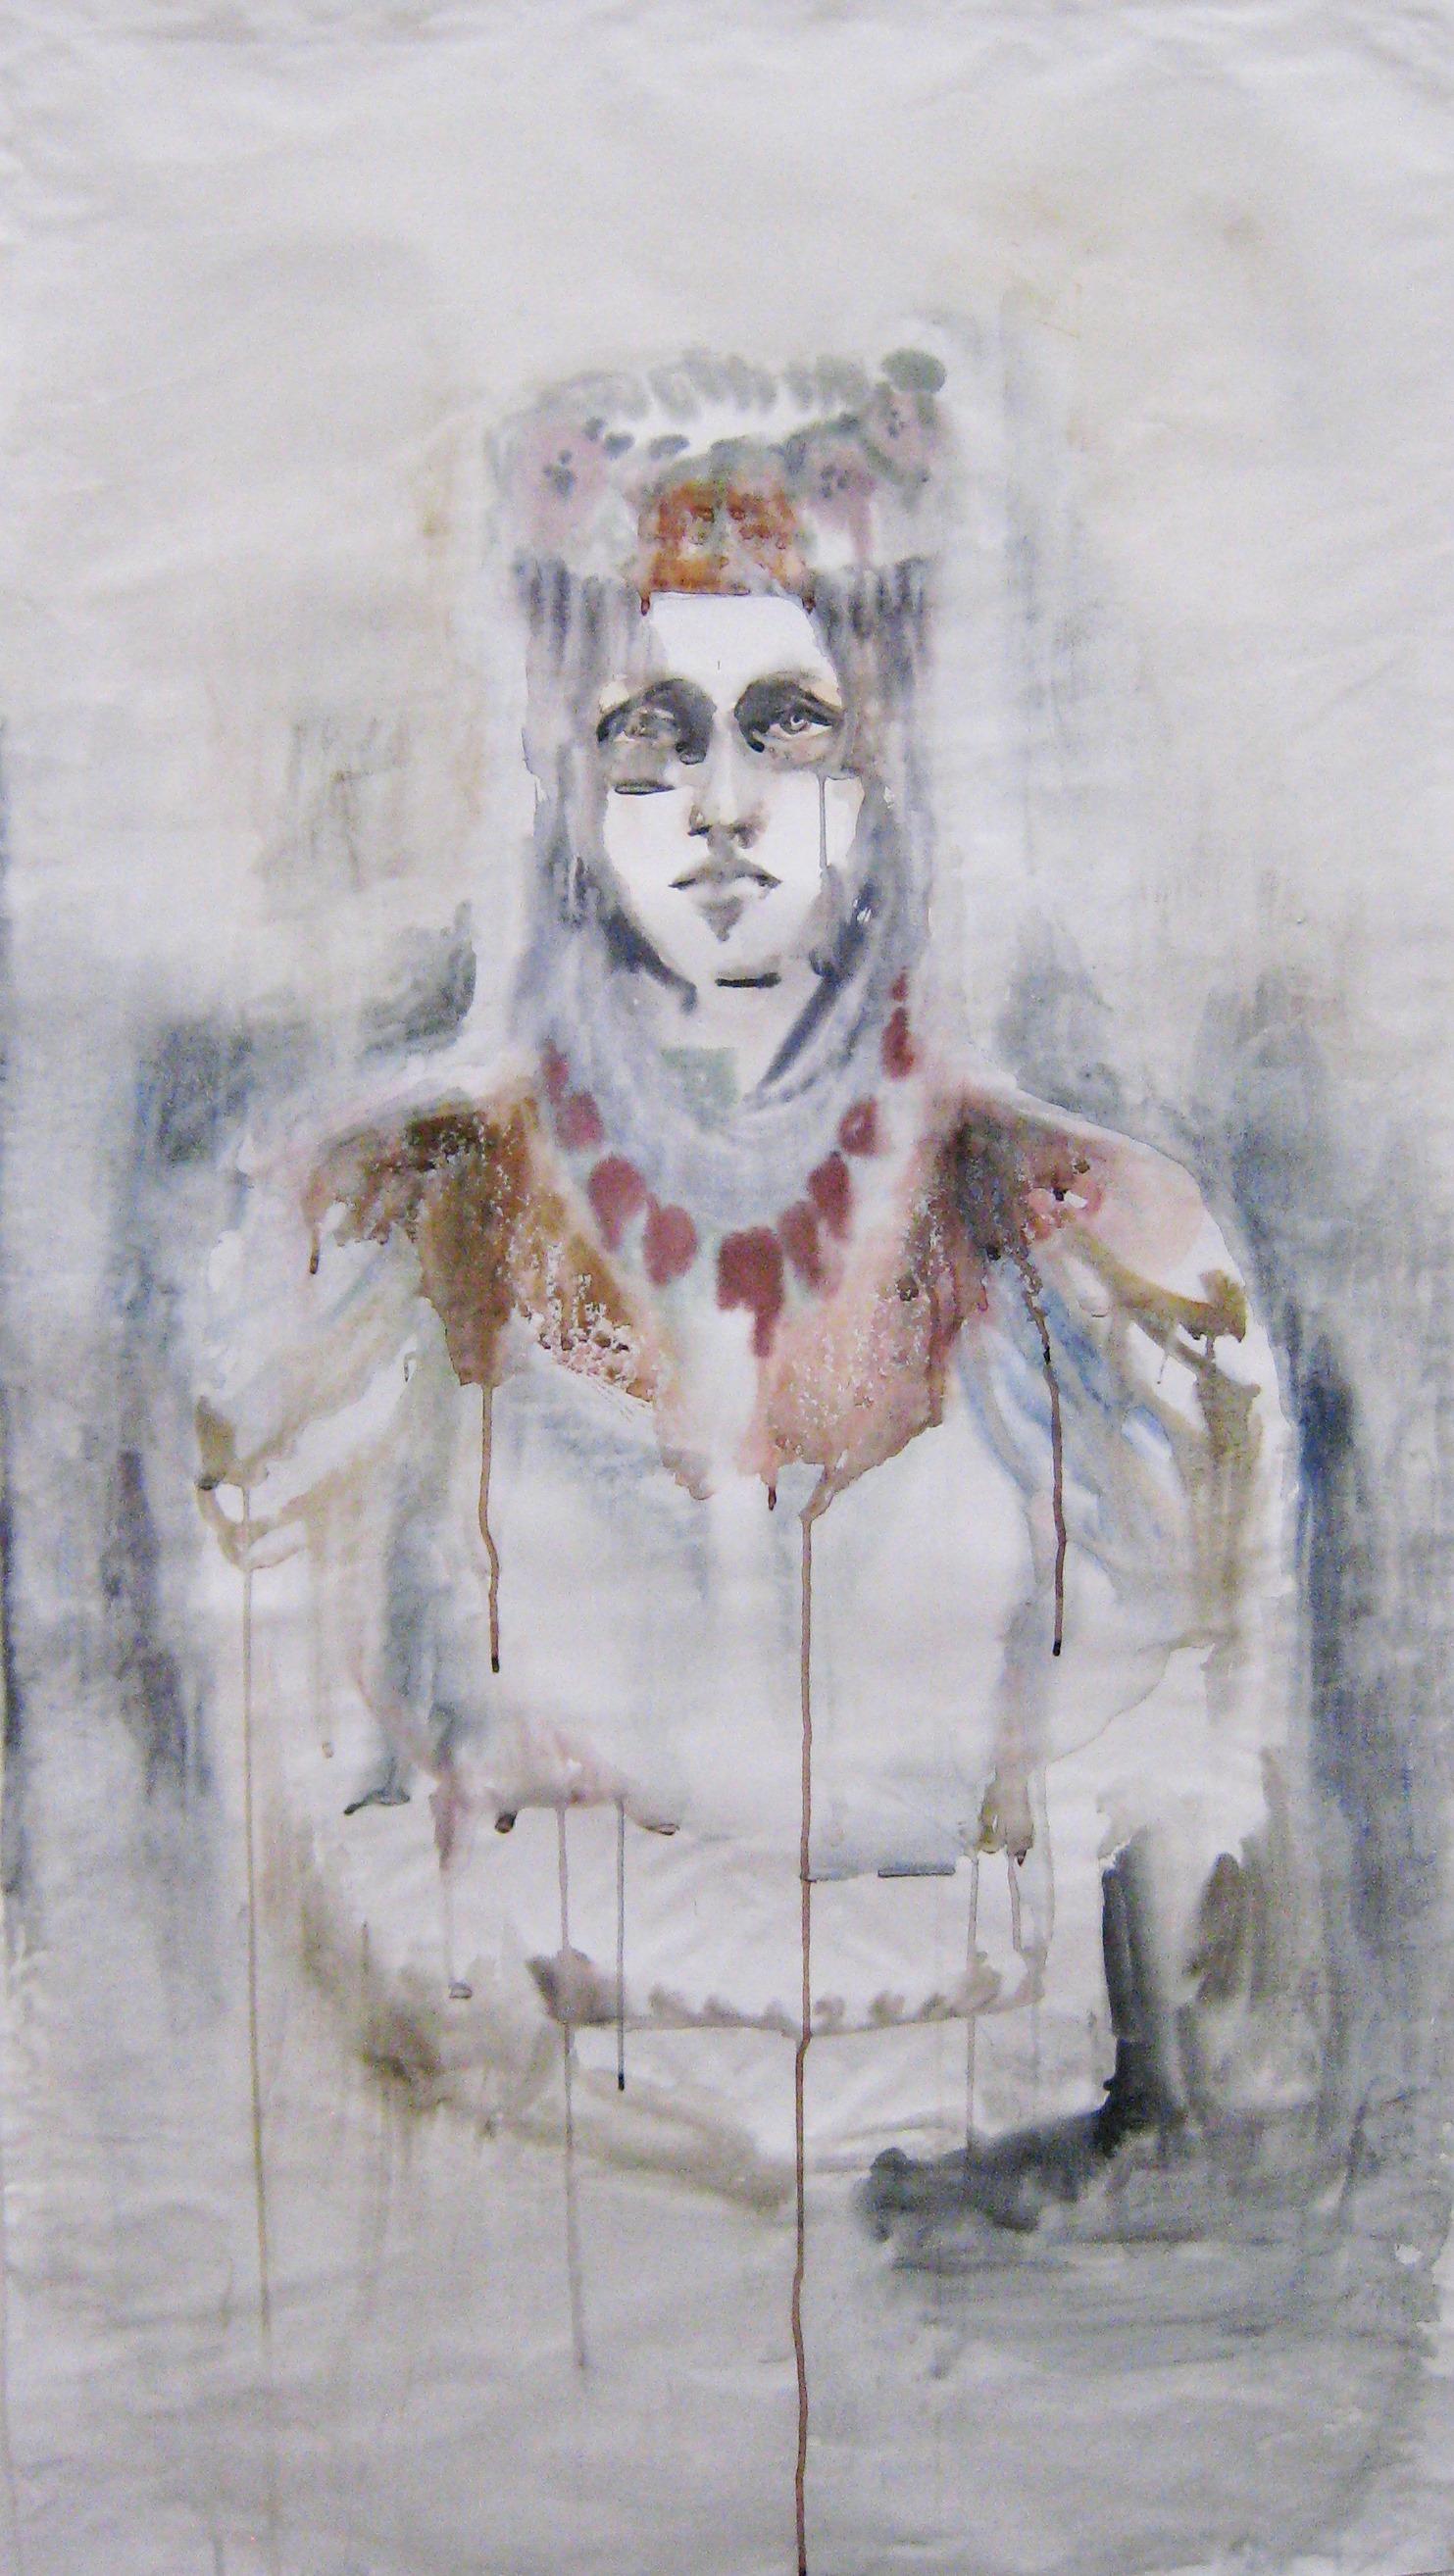 Bulgarin II, aquarelle, 150×85 cm